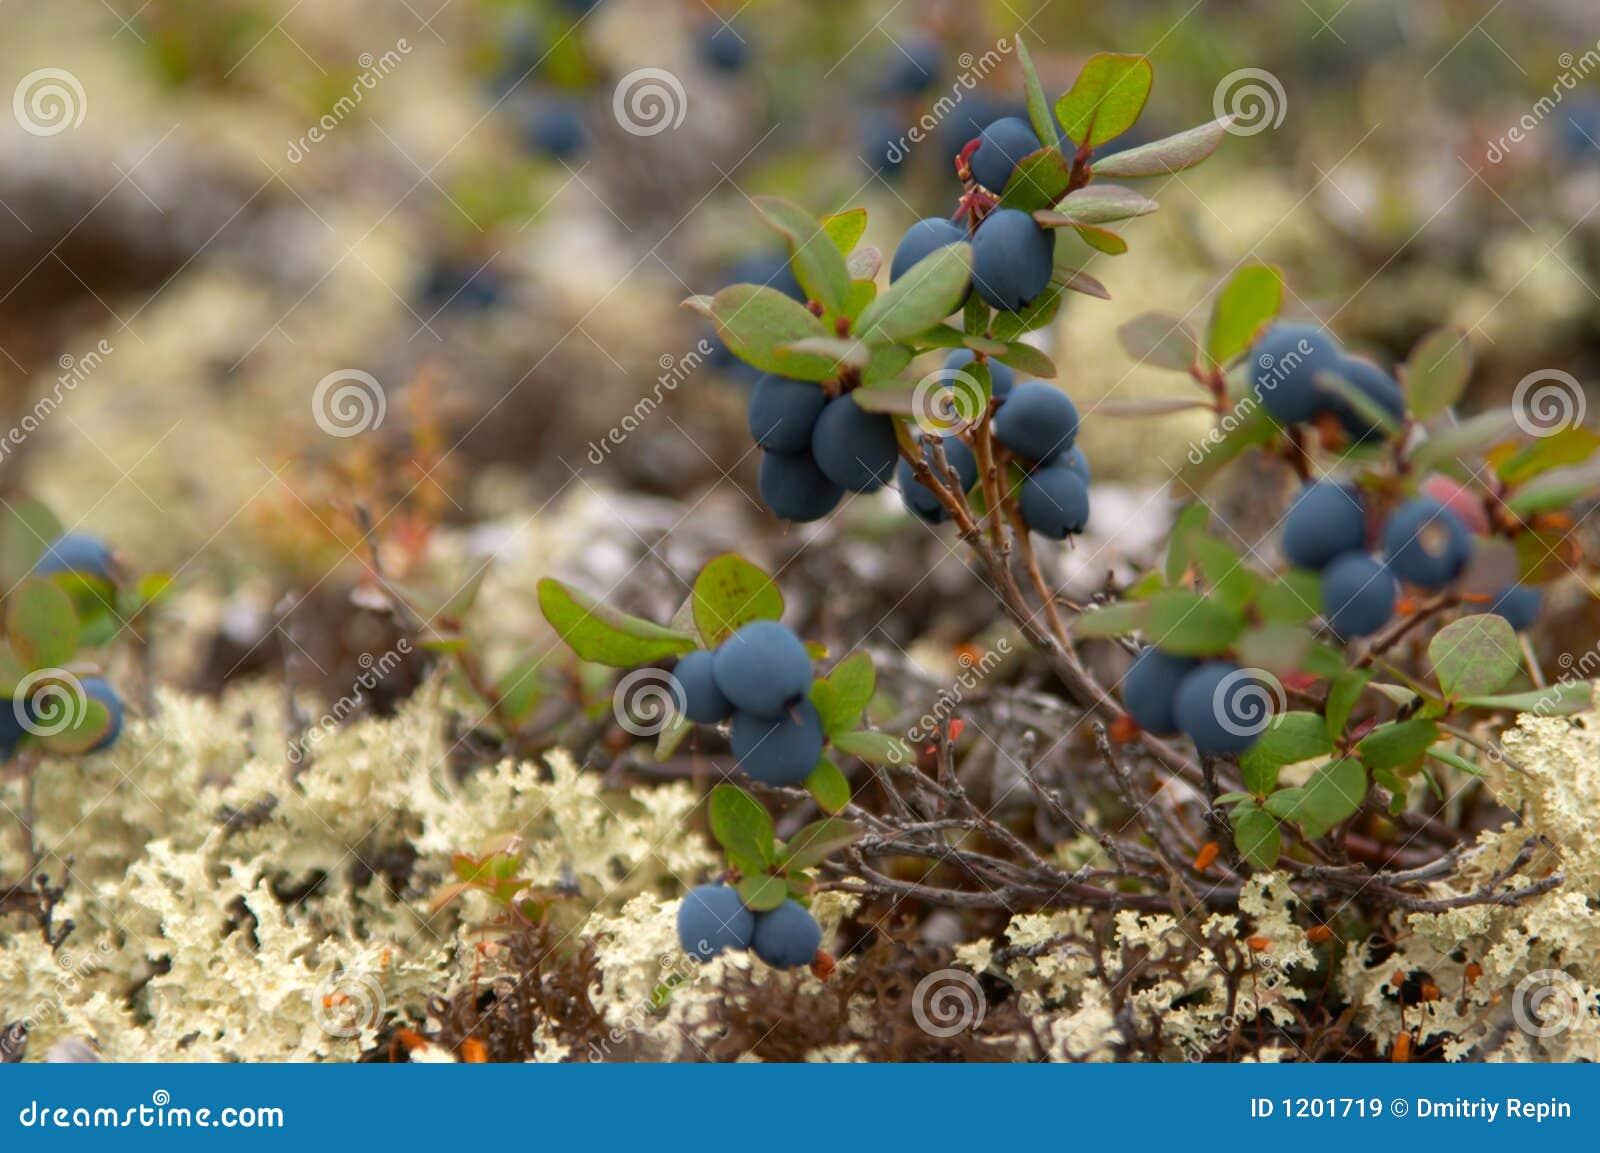 Cloudberry harvest